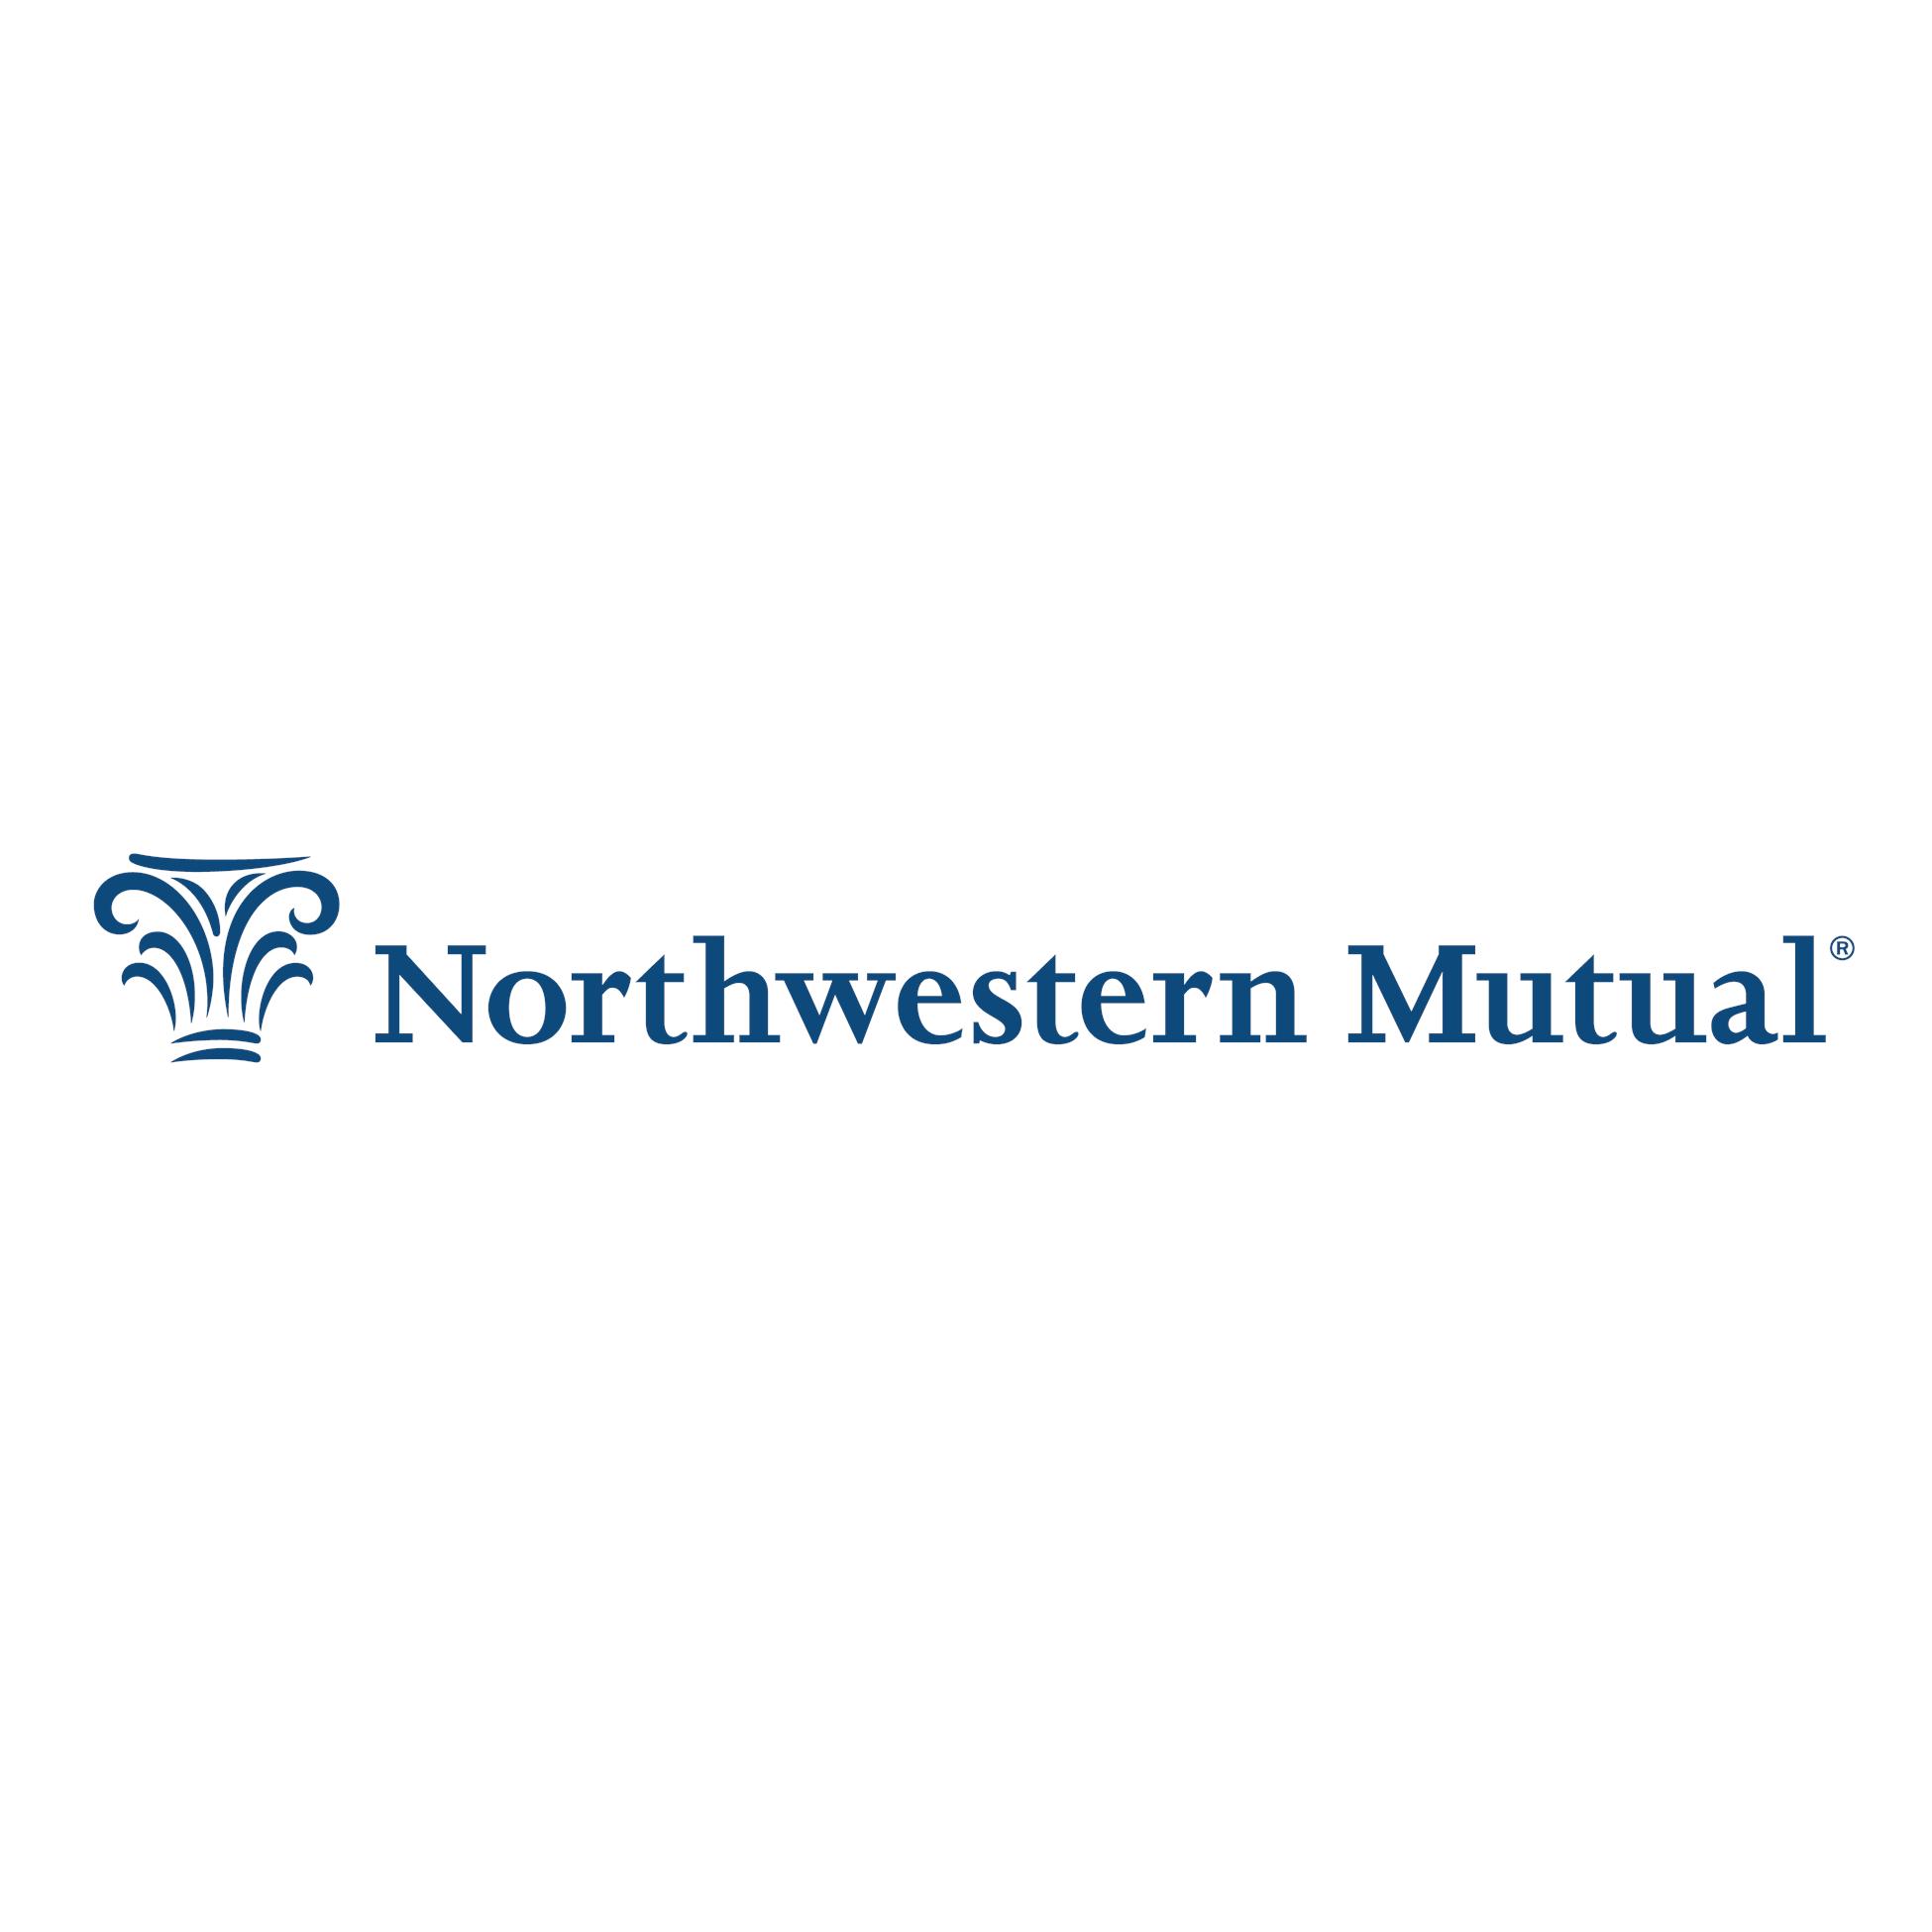 Northwestern Mutual - Greater Chicago logo